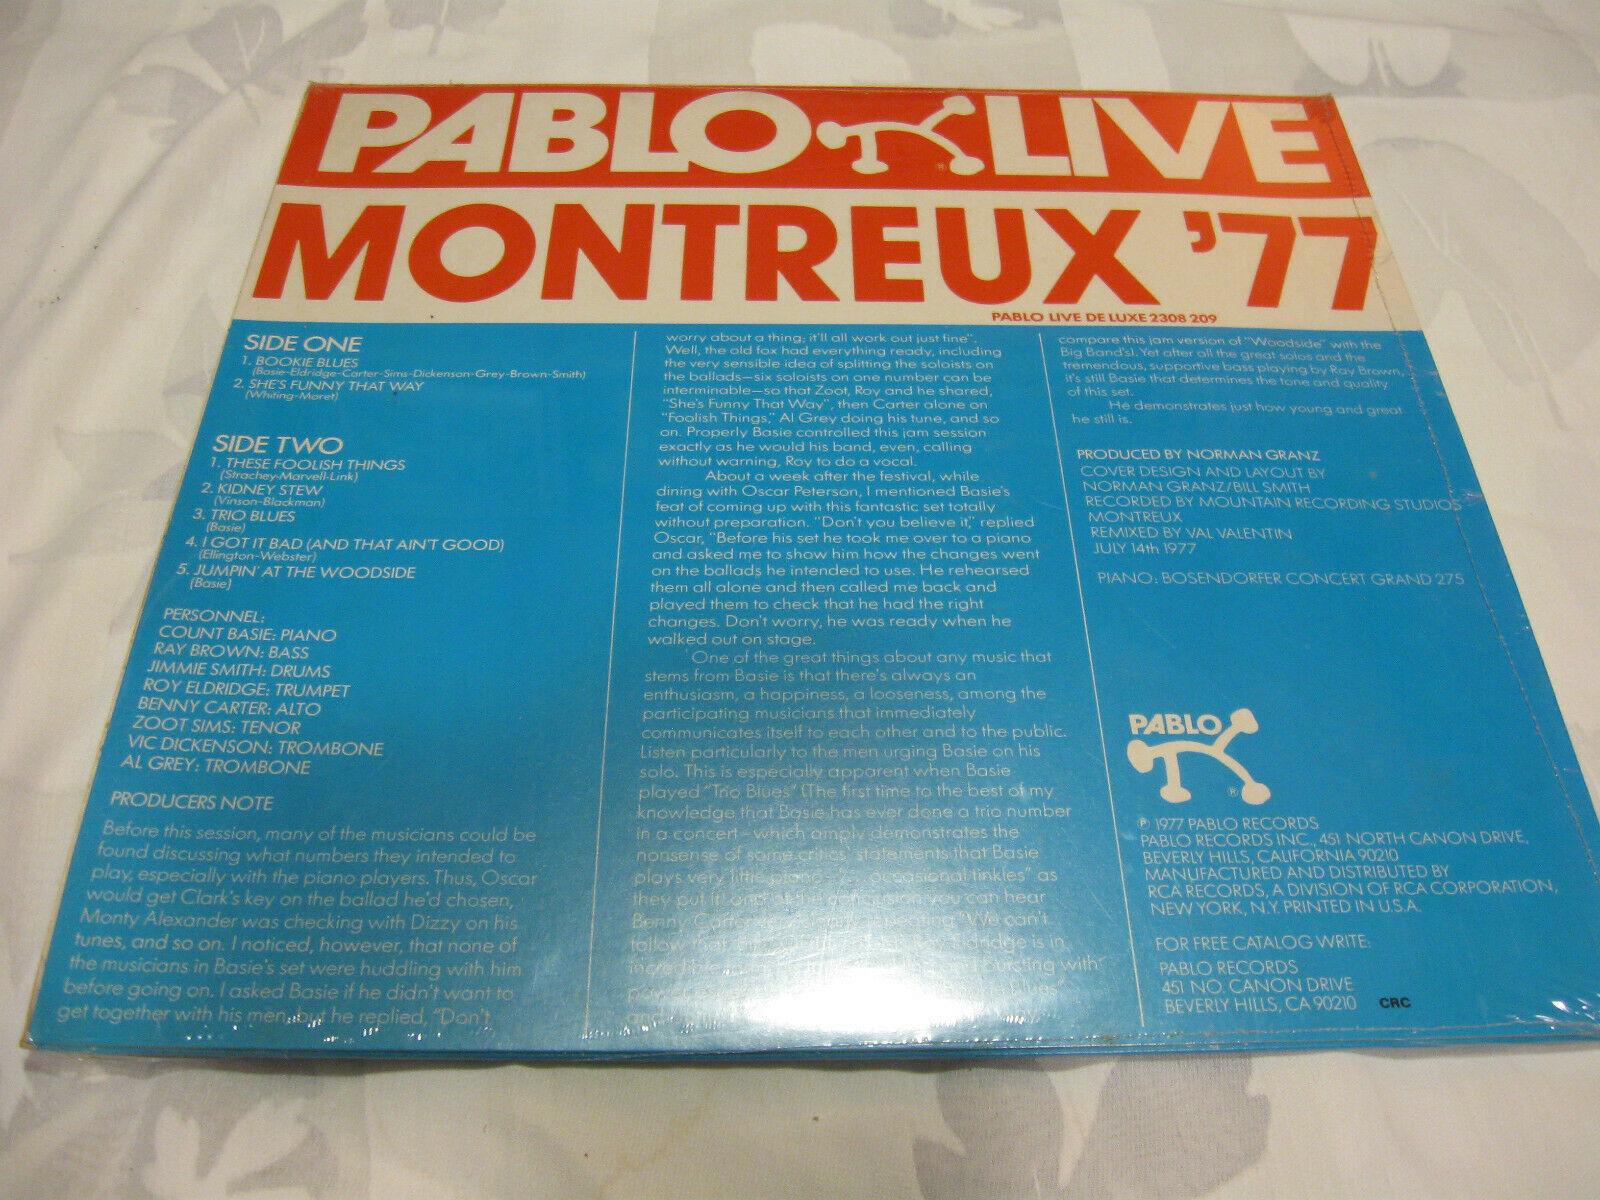 Count Basie Jam Montreux 77 Pablo 2308 239 Stereo Vinyl Record LP Jazz SEALED image 2